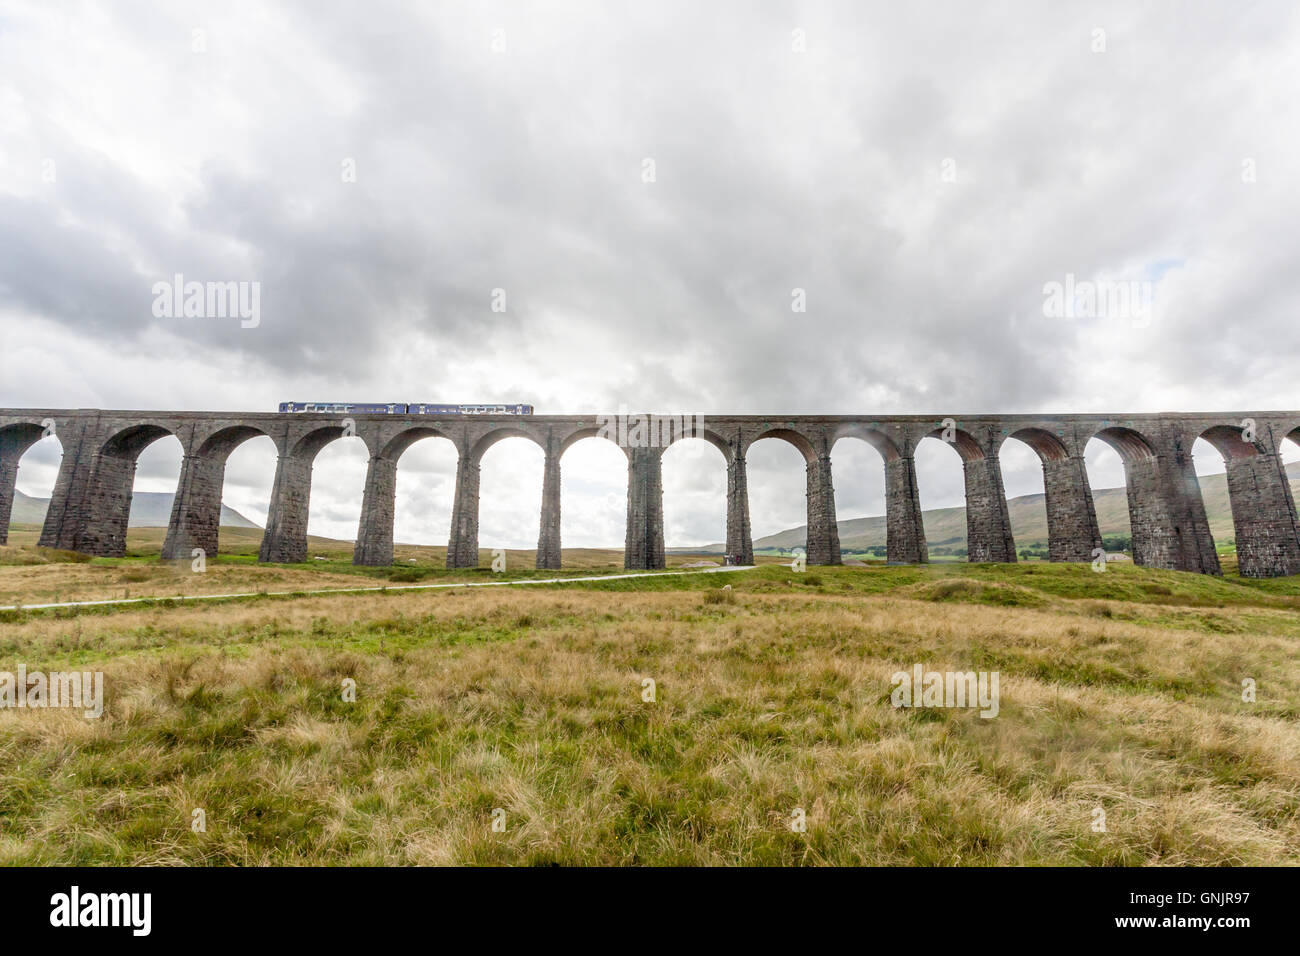 Ribblehead Viaduct, Yorkshire Dales National Park, UK - Stock Image